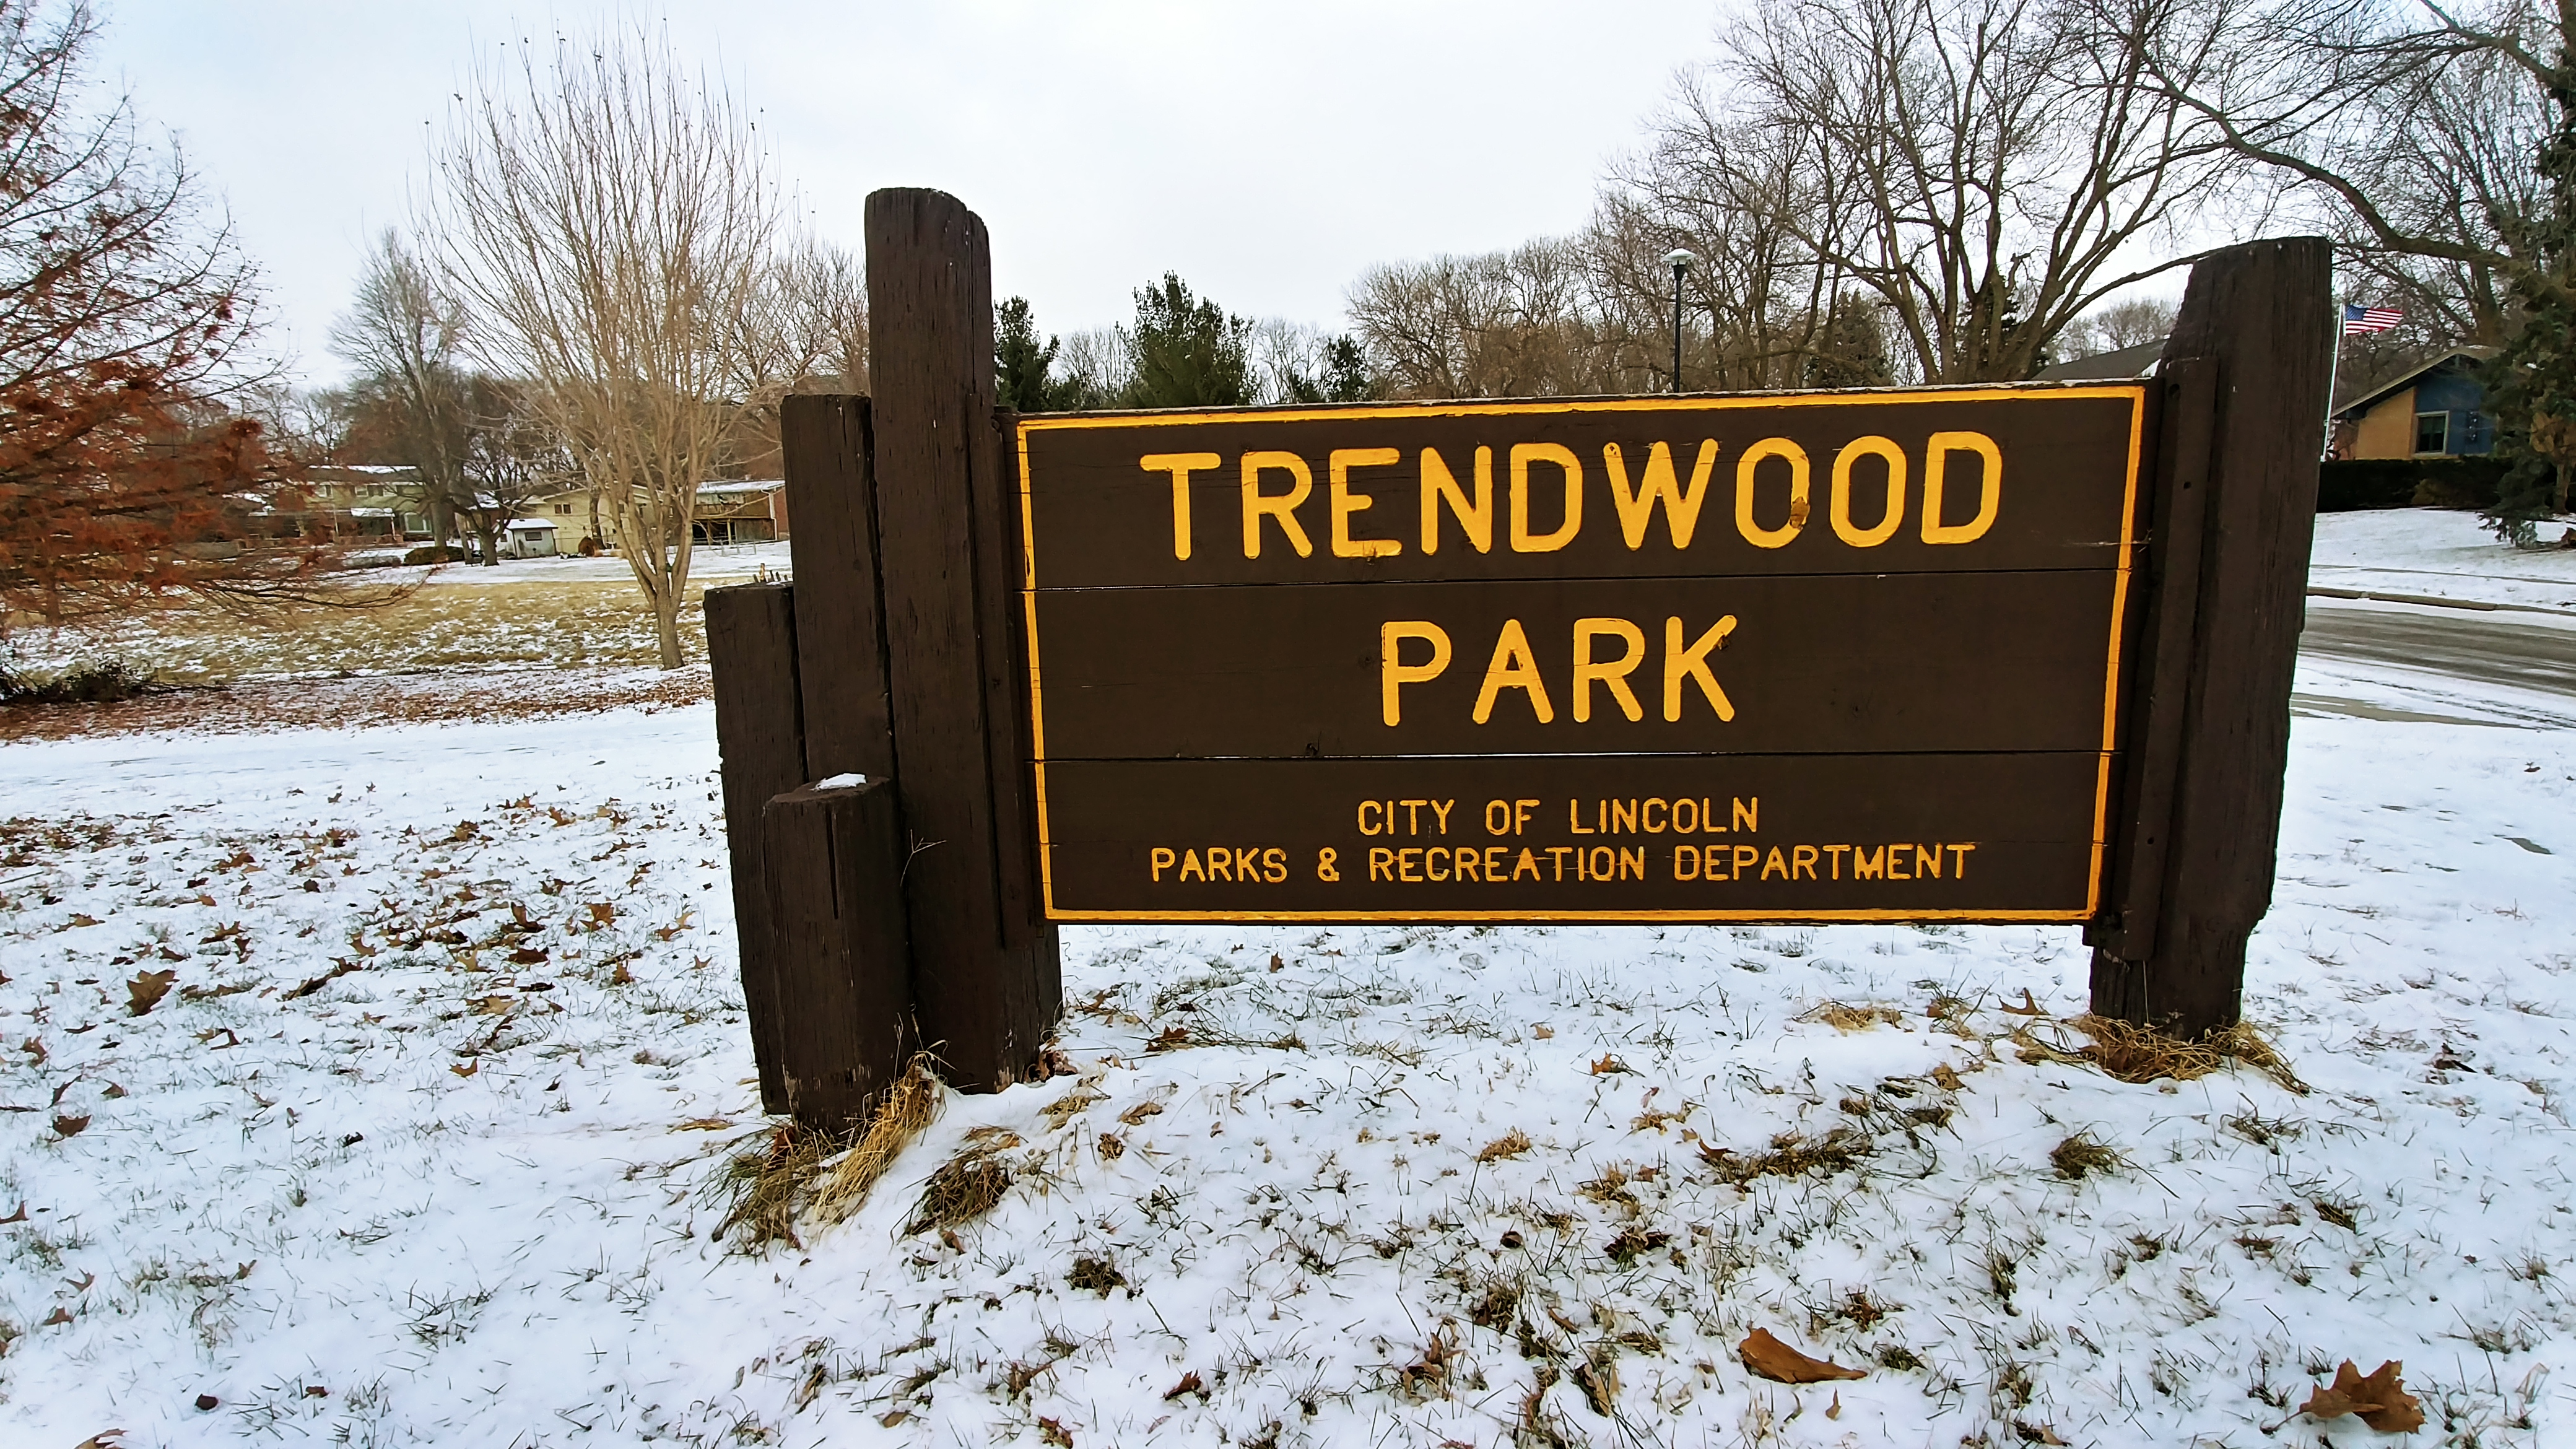 Trendwood Park